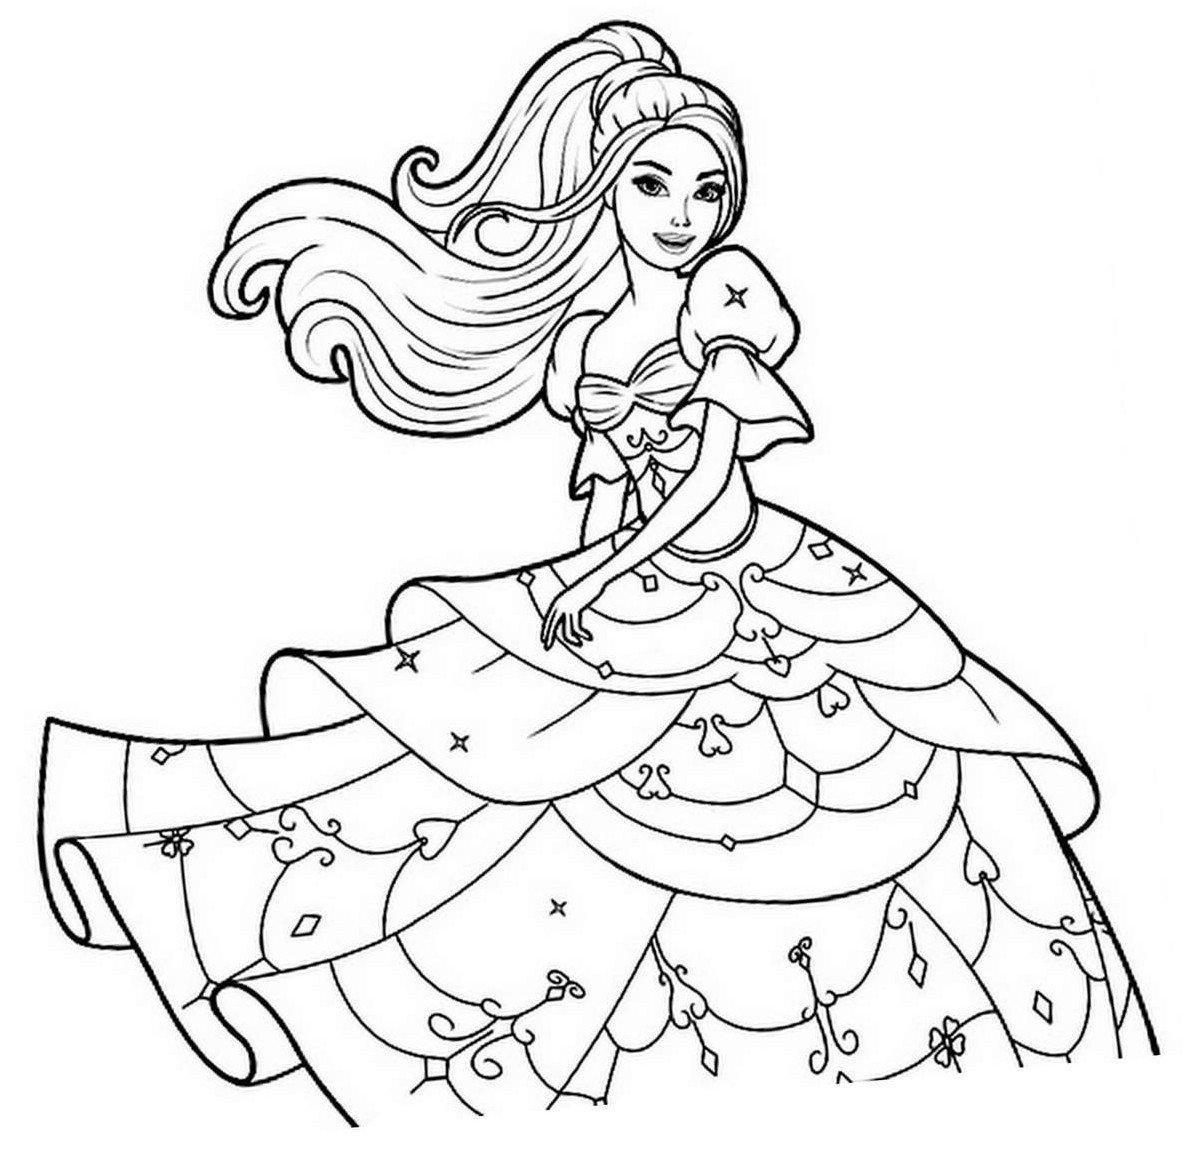 Fotos de barbie para pintar - Dibujos para sabanitas de bebe ...